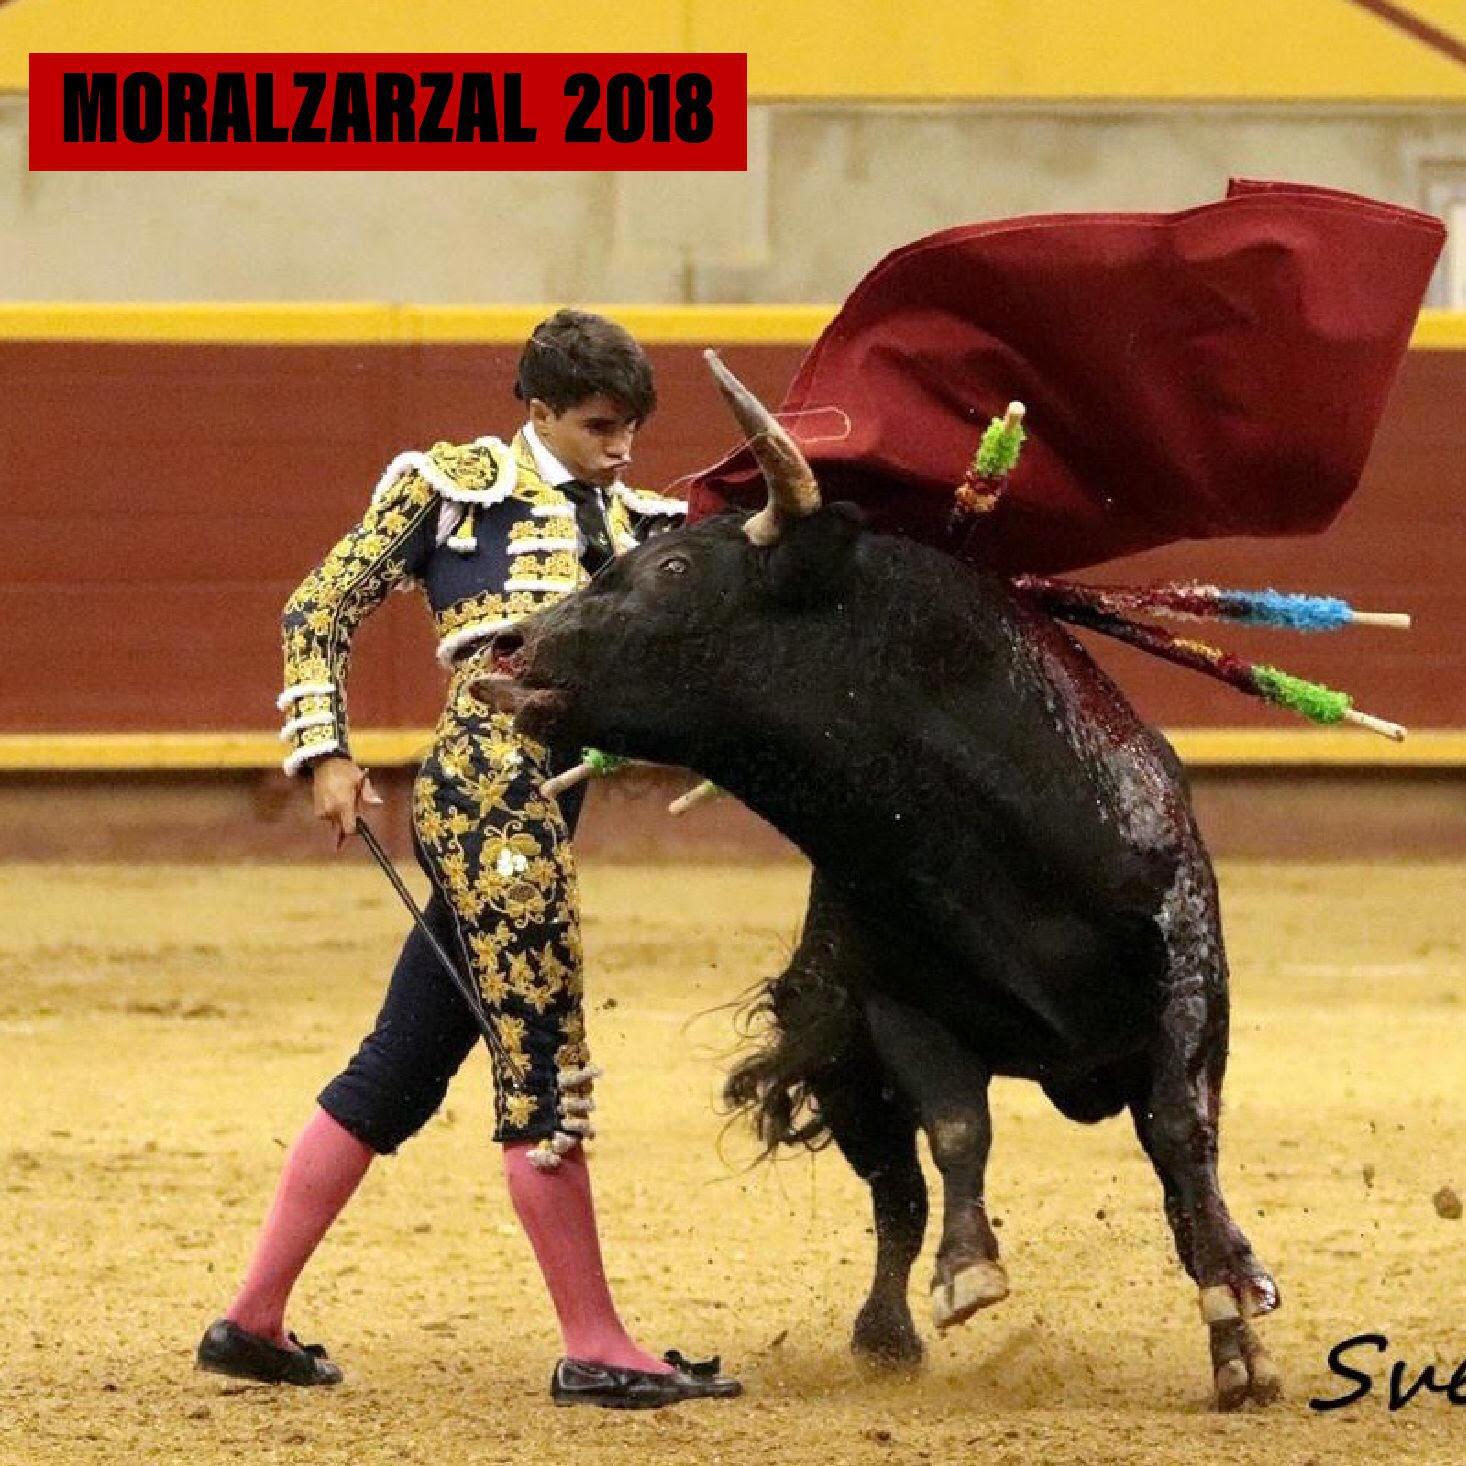 Moralzarzal 2018